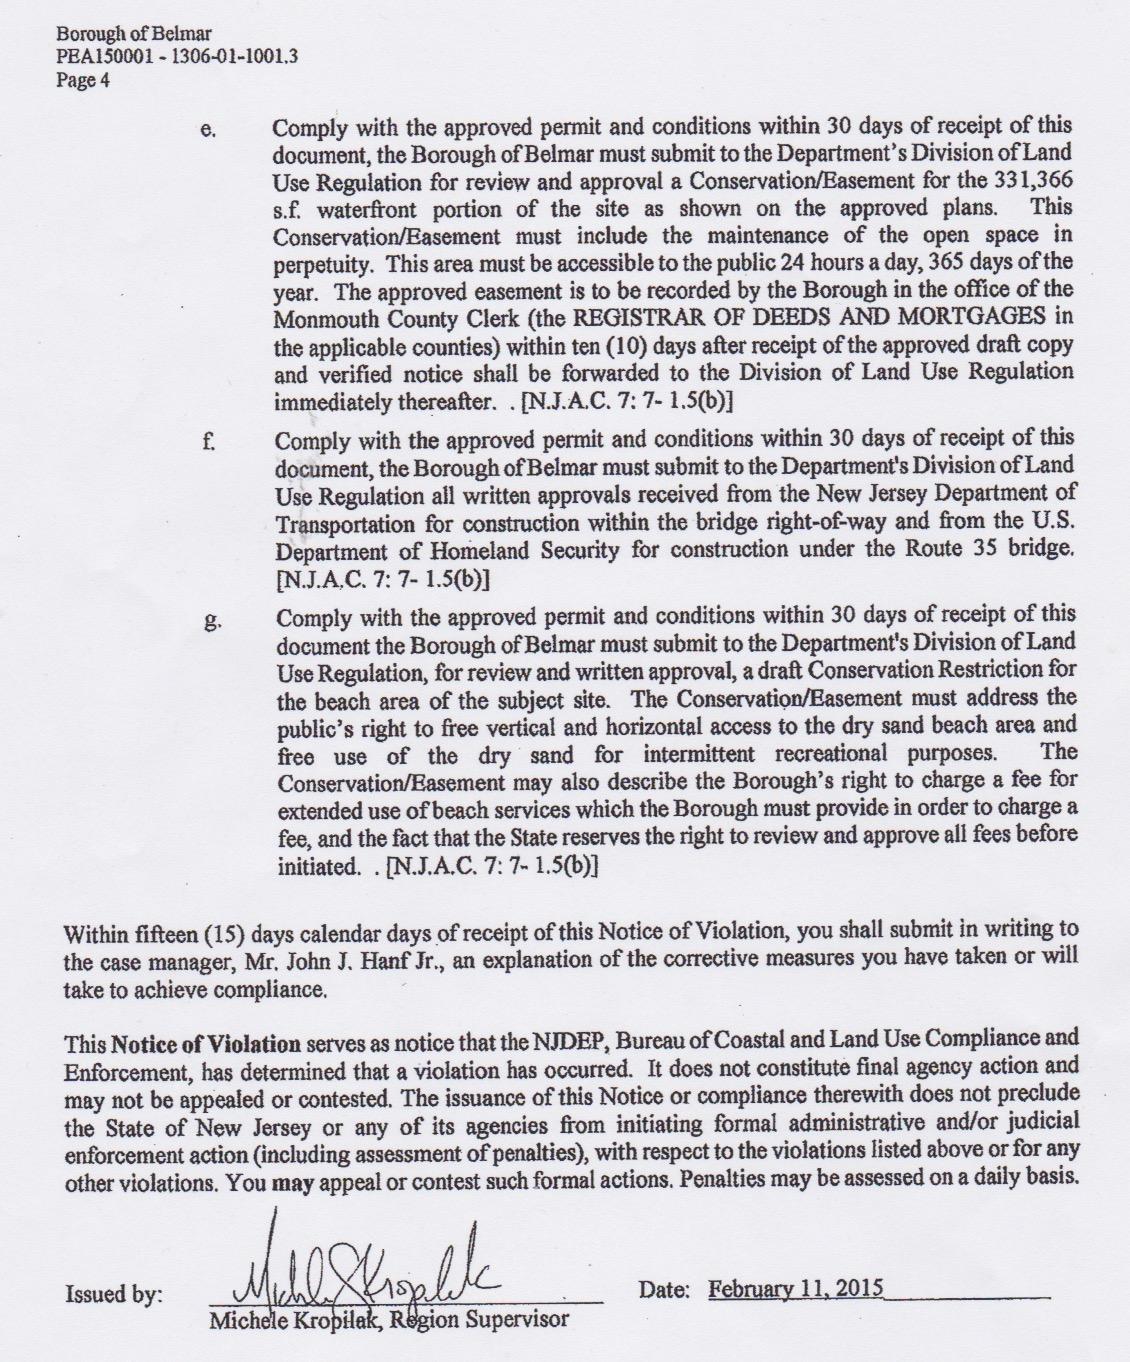 cafra violation notice 4